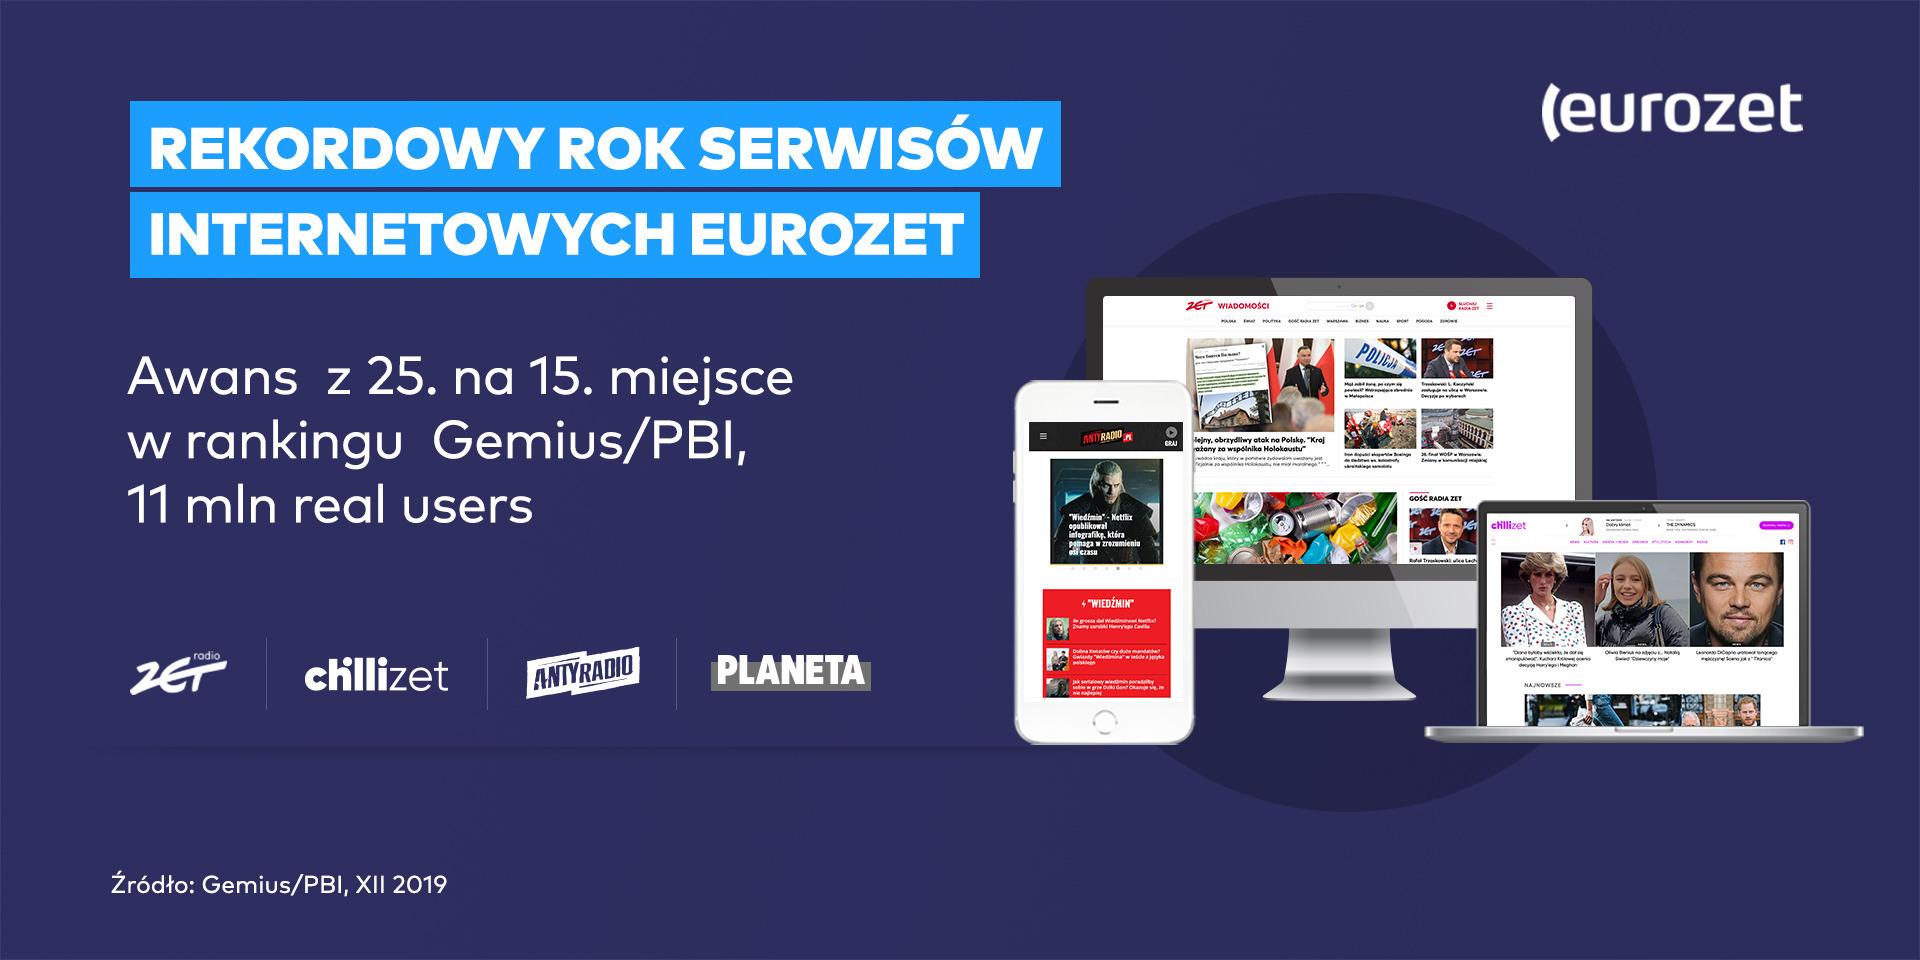 Rekordowy rok online Grupy Eurozet